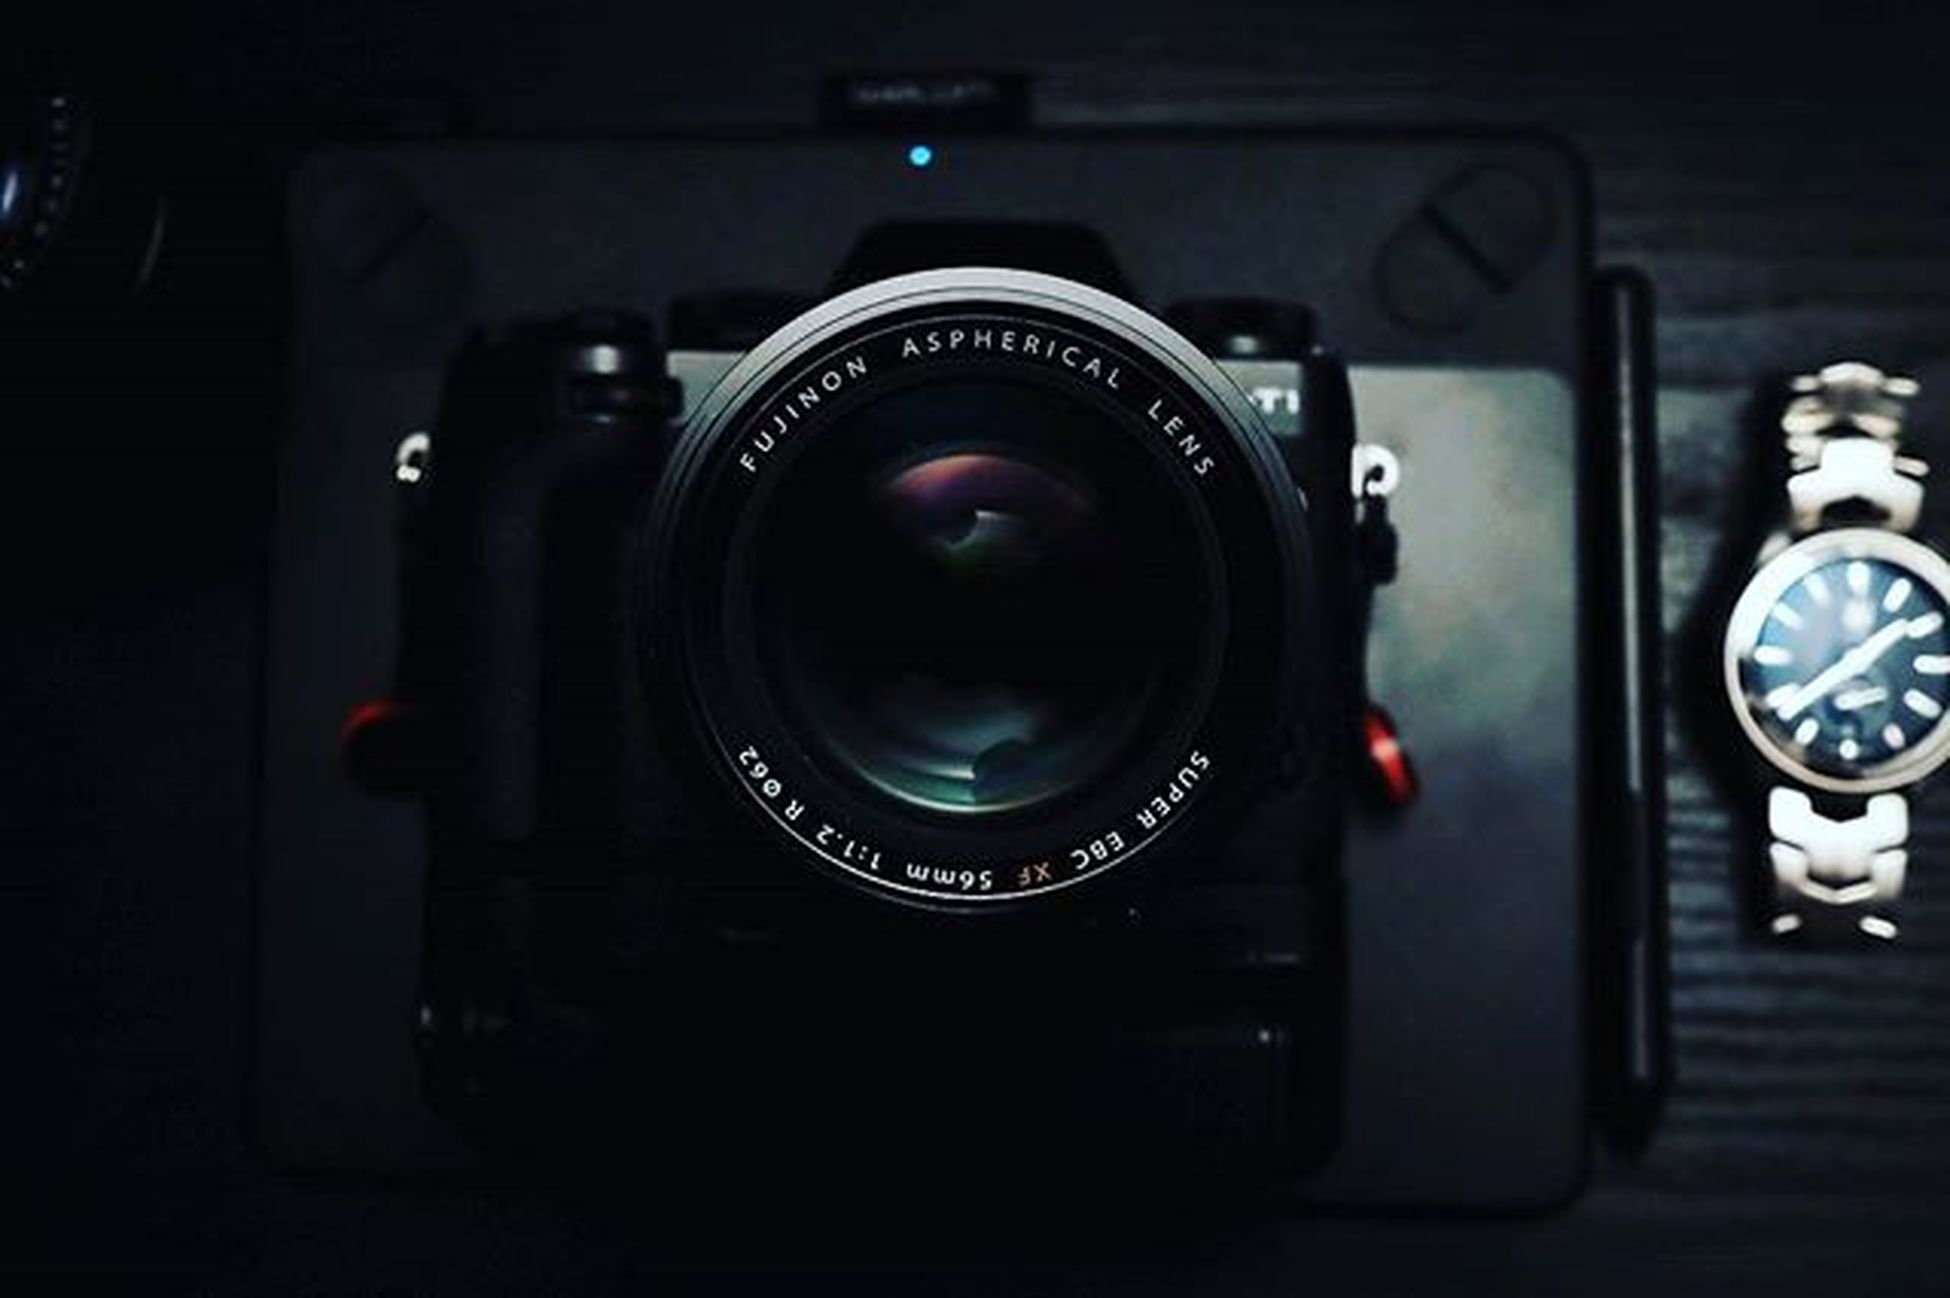 Just wanna go shoot... Sunday portrait session anyone? Rainraingoaway  Moodygrams Create LateNightArt Fujifimxt1 56mm Classicchrome Wacom Tagheuer Gear